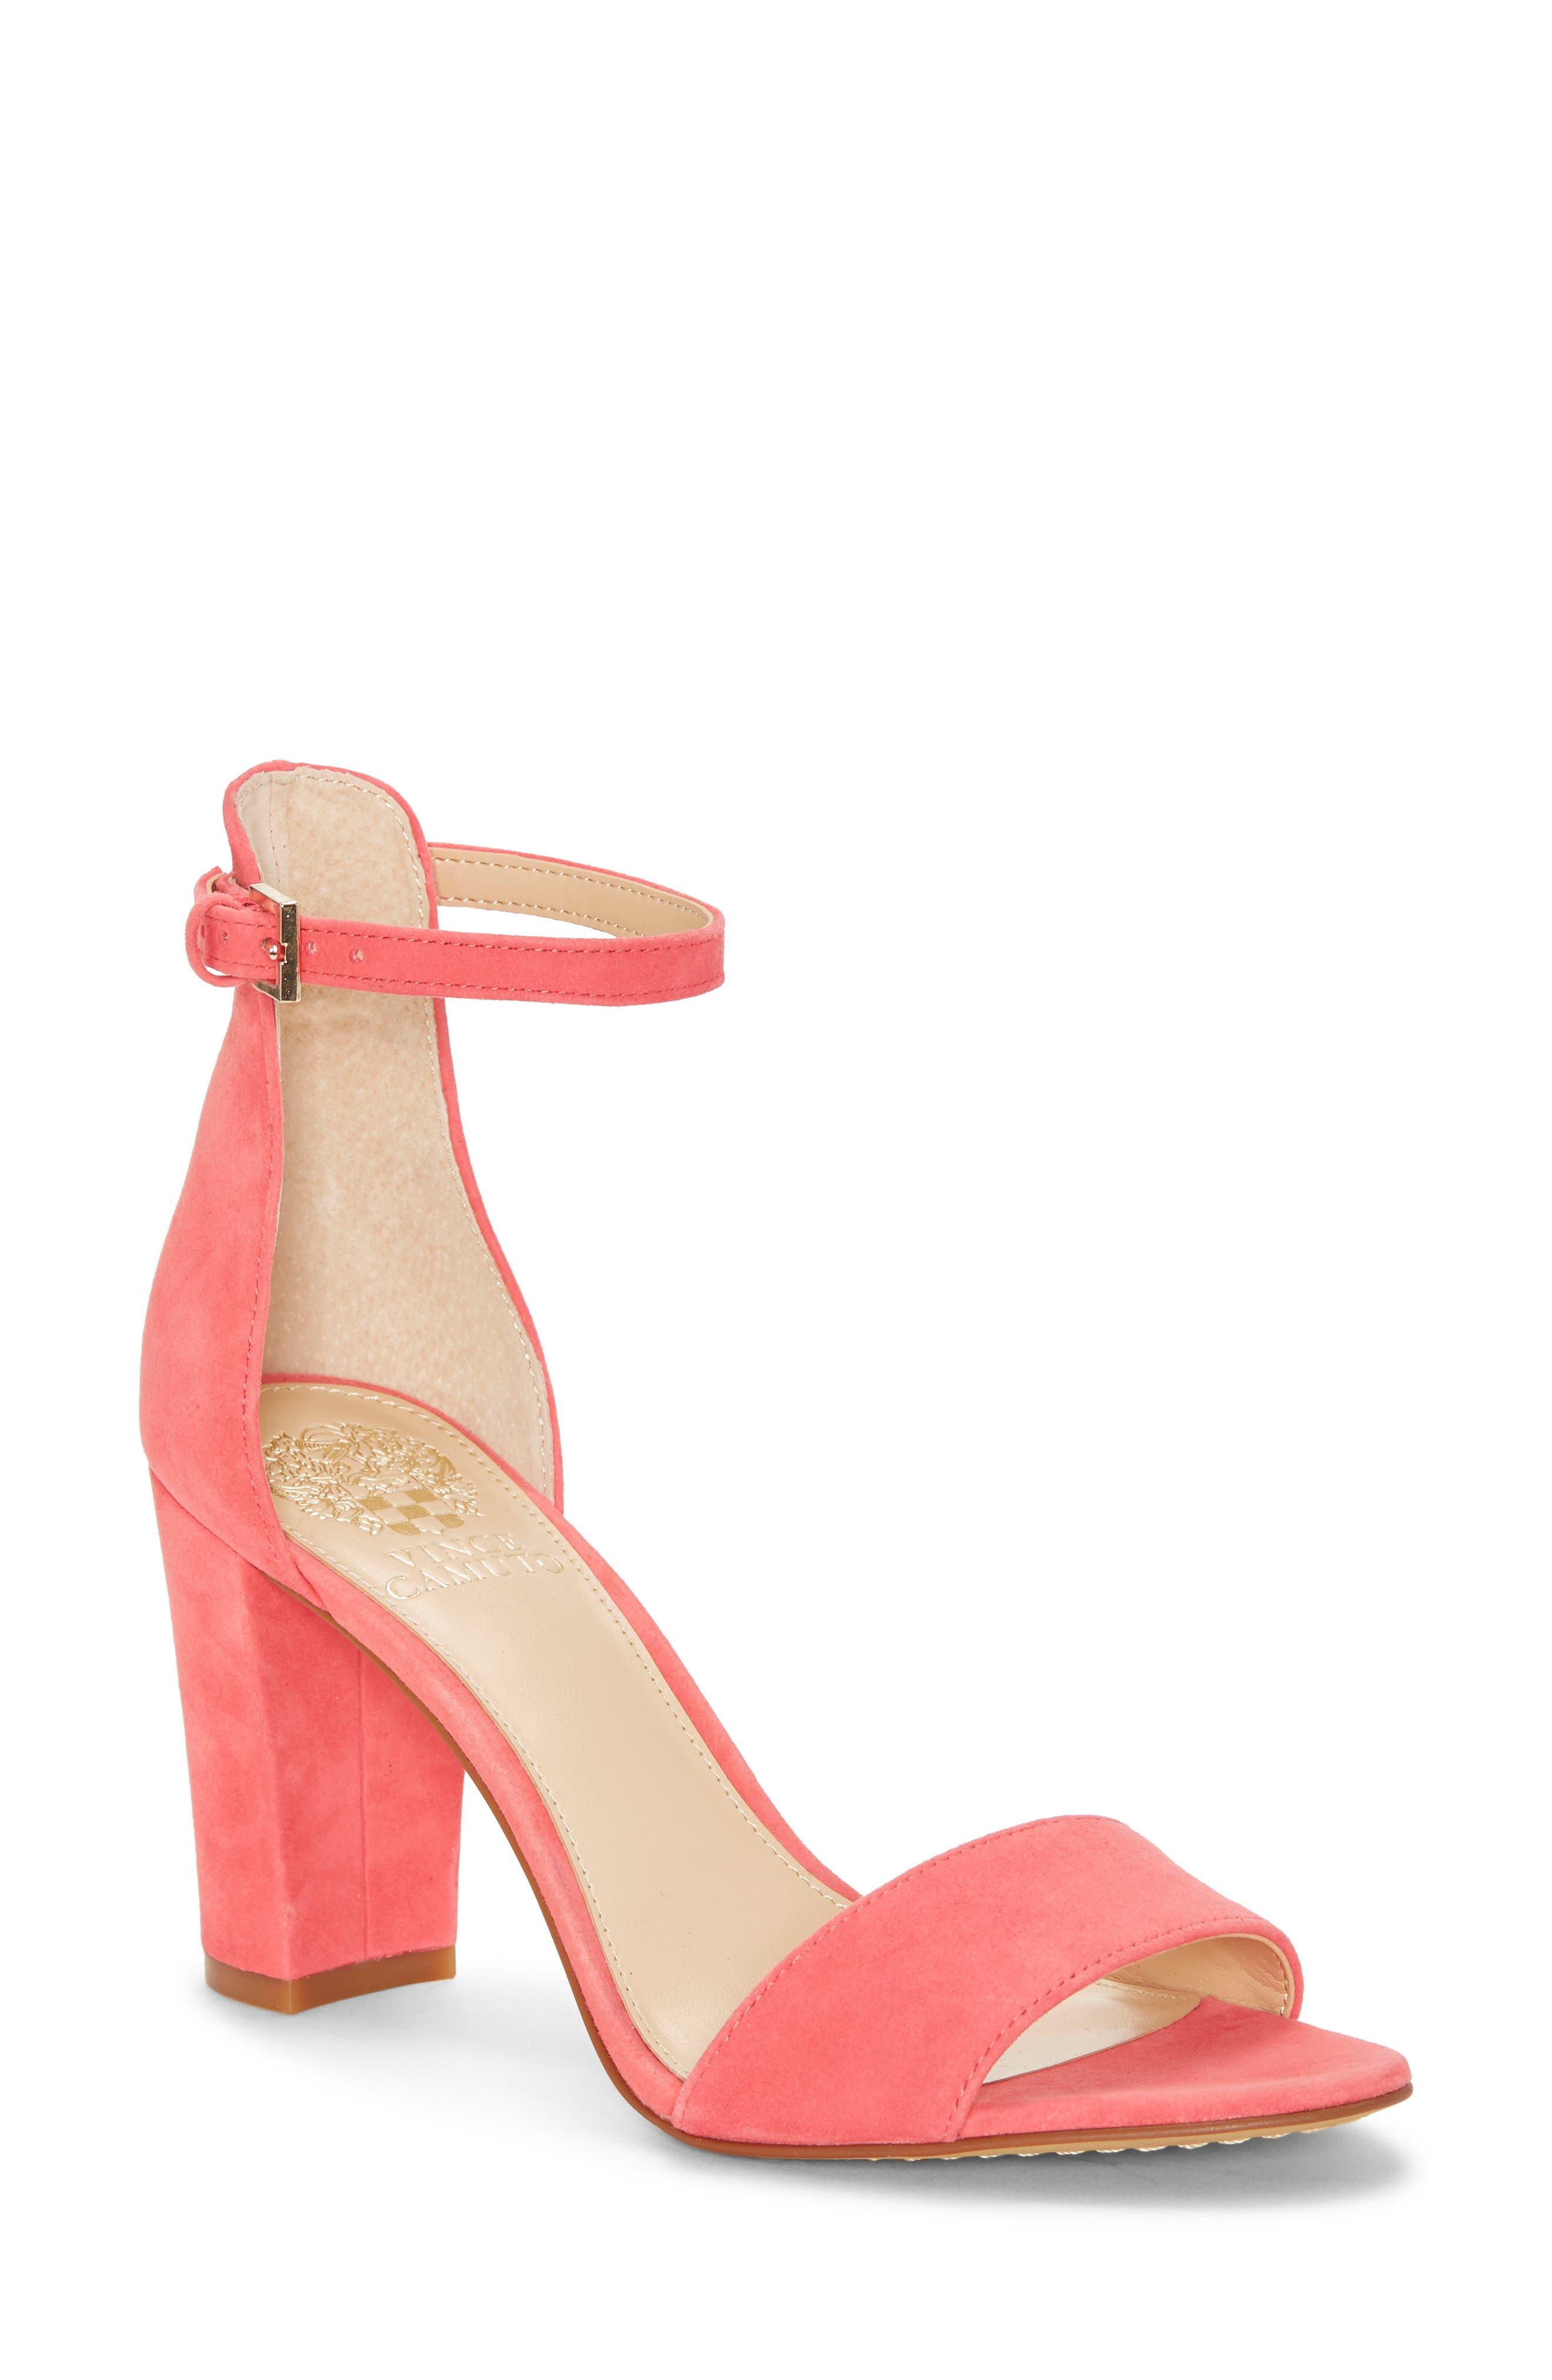 c969f950da9 Women s Vince Camuto Heels